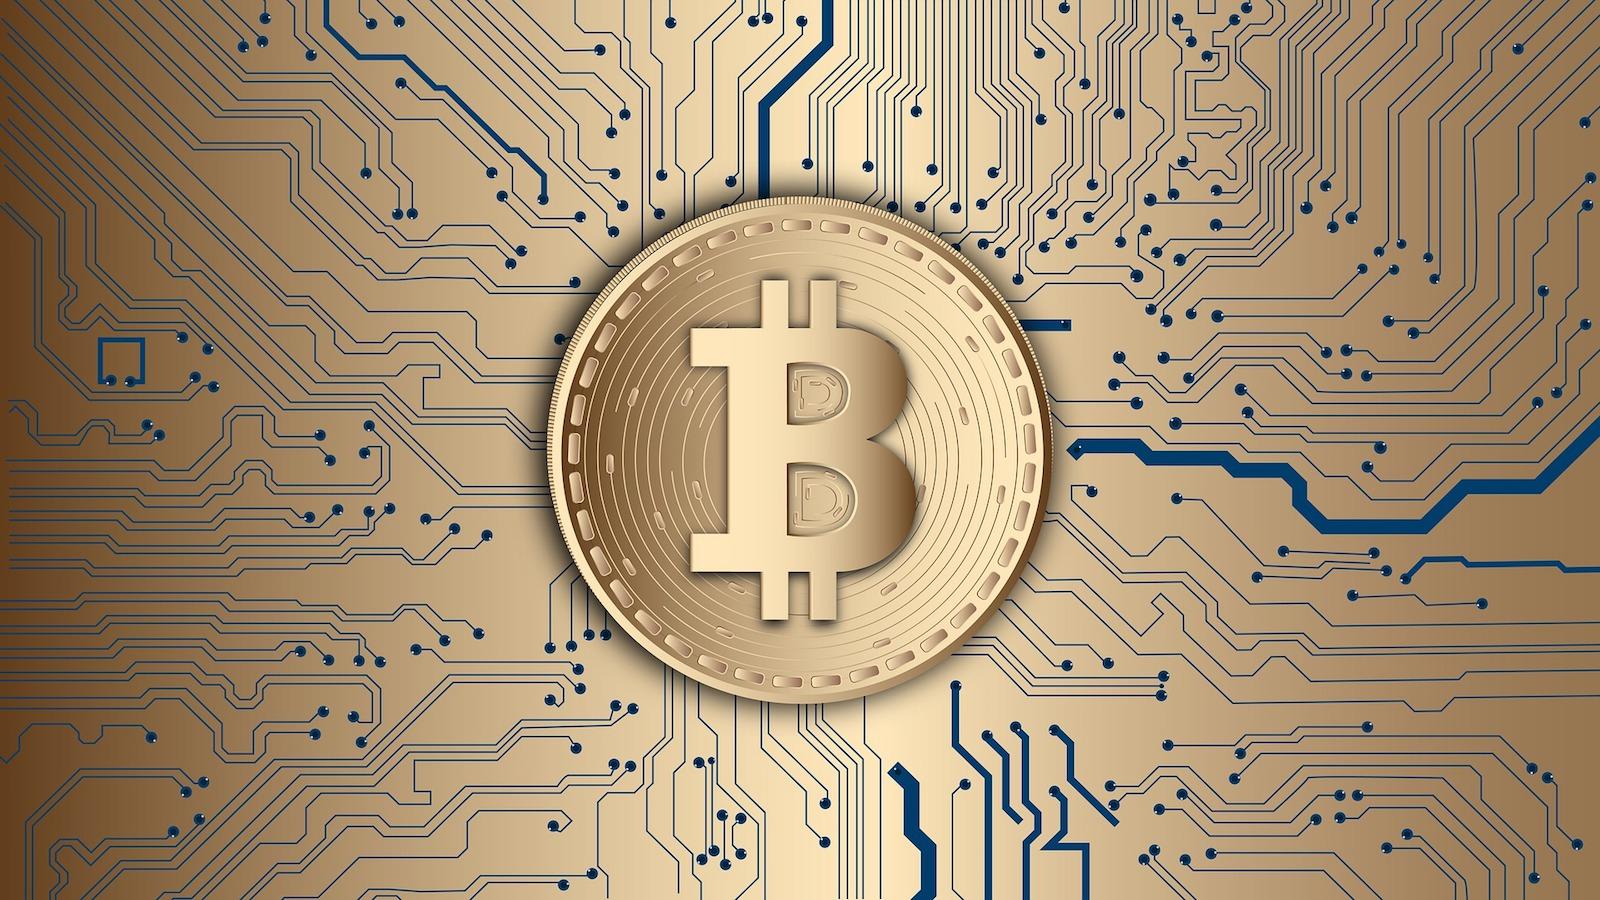 57 ukraїnśkyh čynovnykiv zadeklaruvaly Bitcoin